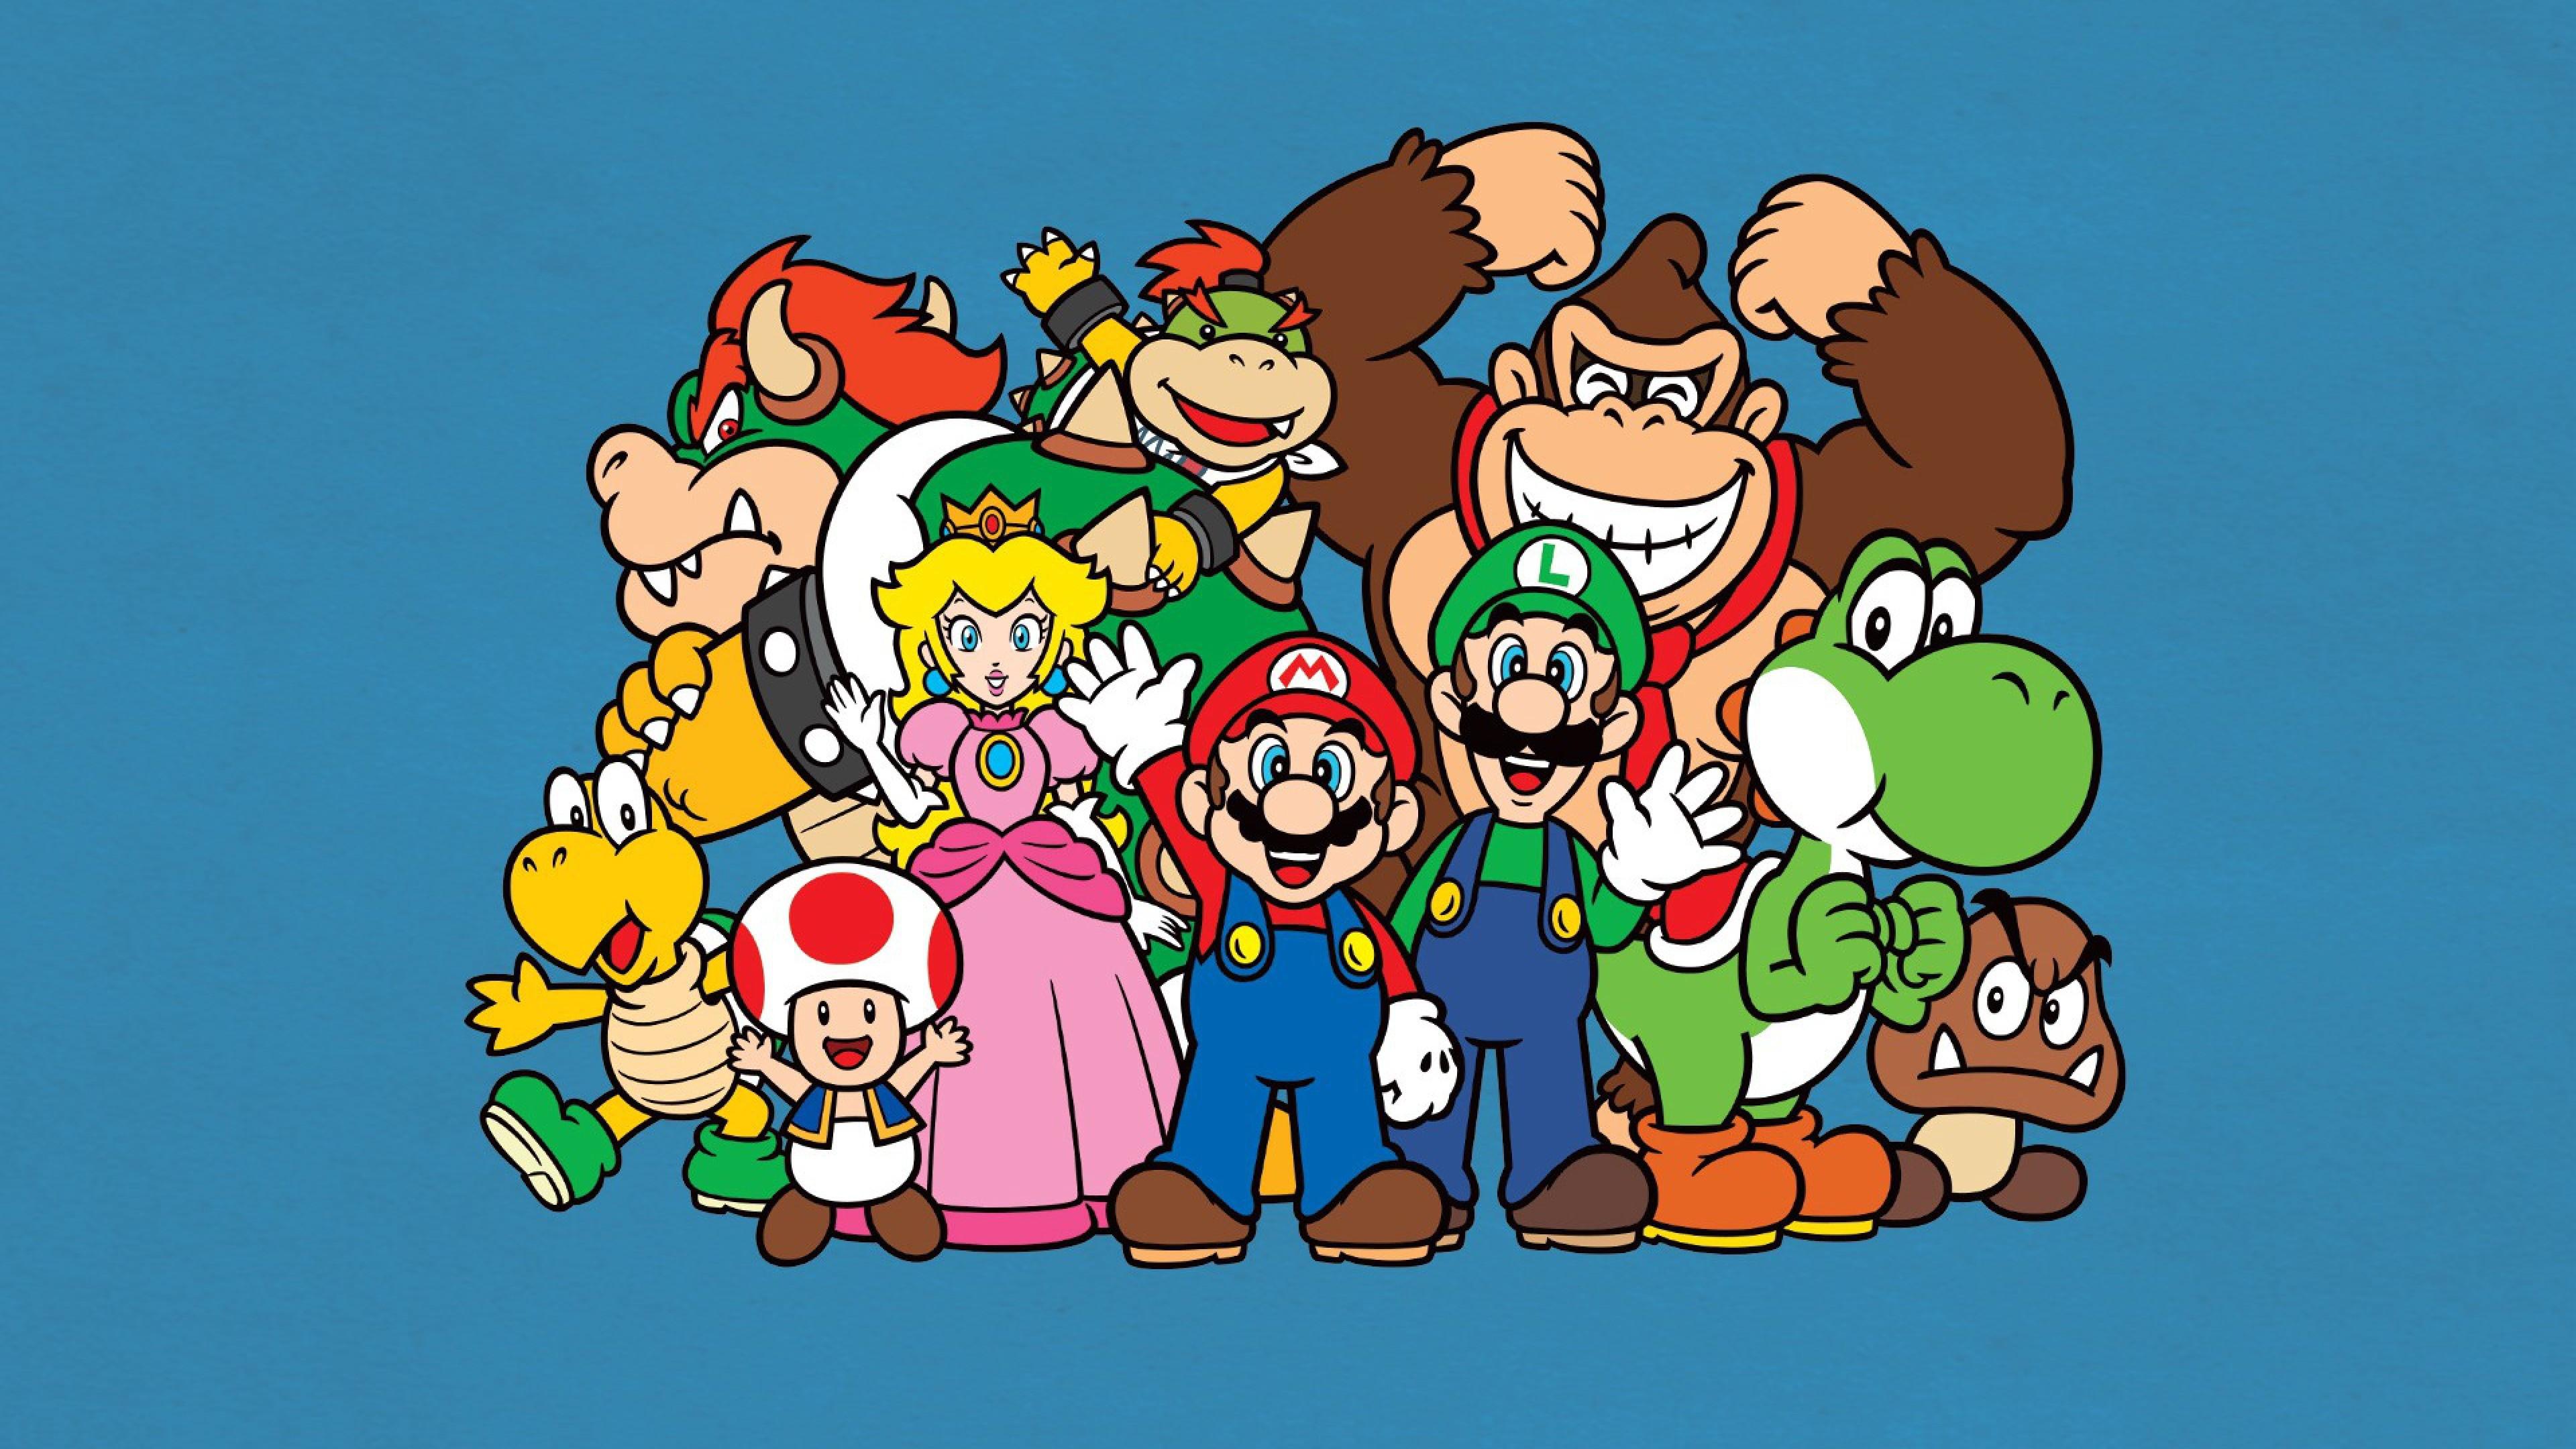 Download Wallpaper Mario bros, Luigi, Yoshi, Princess .